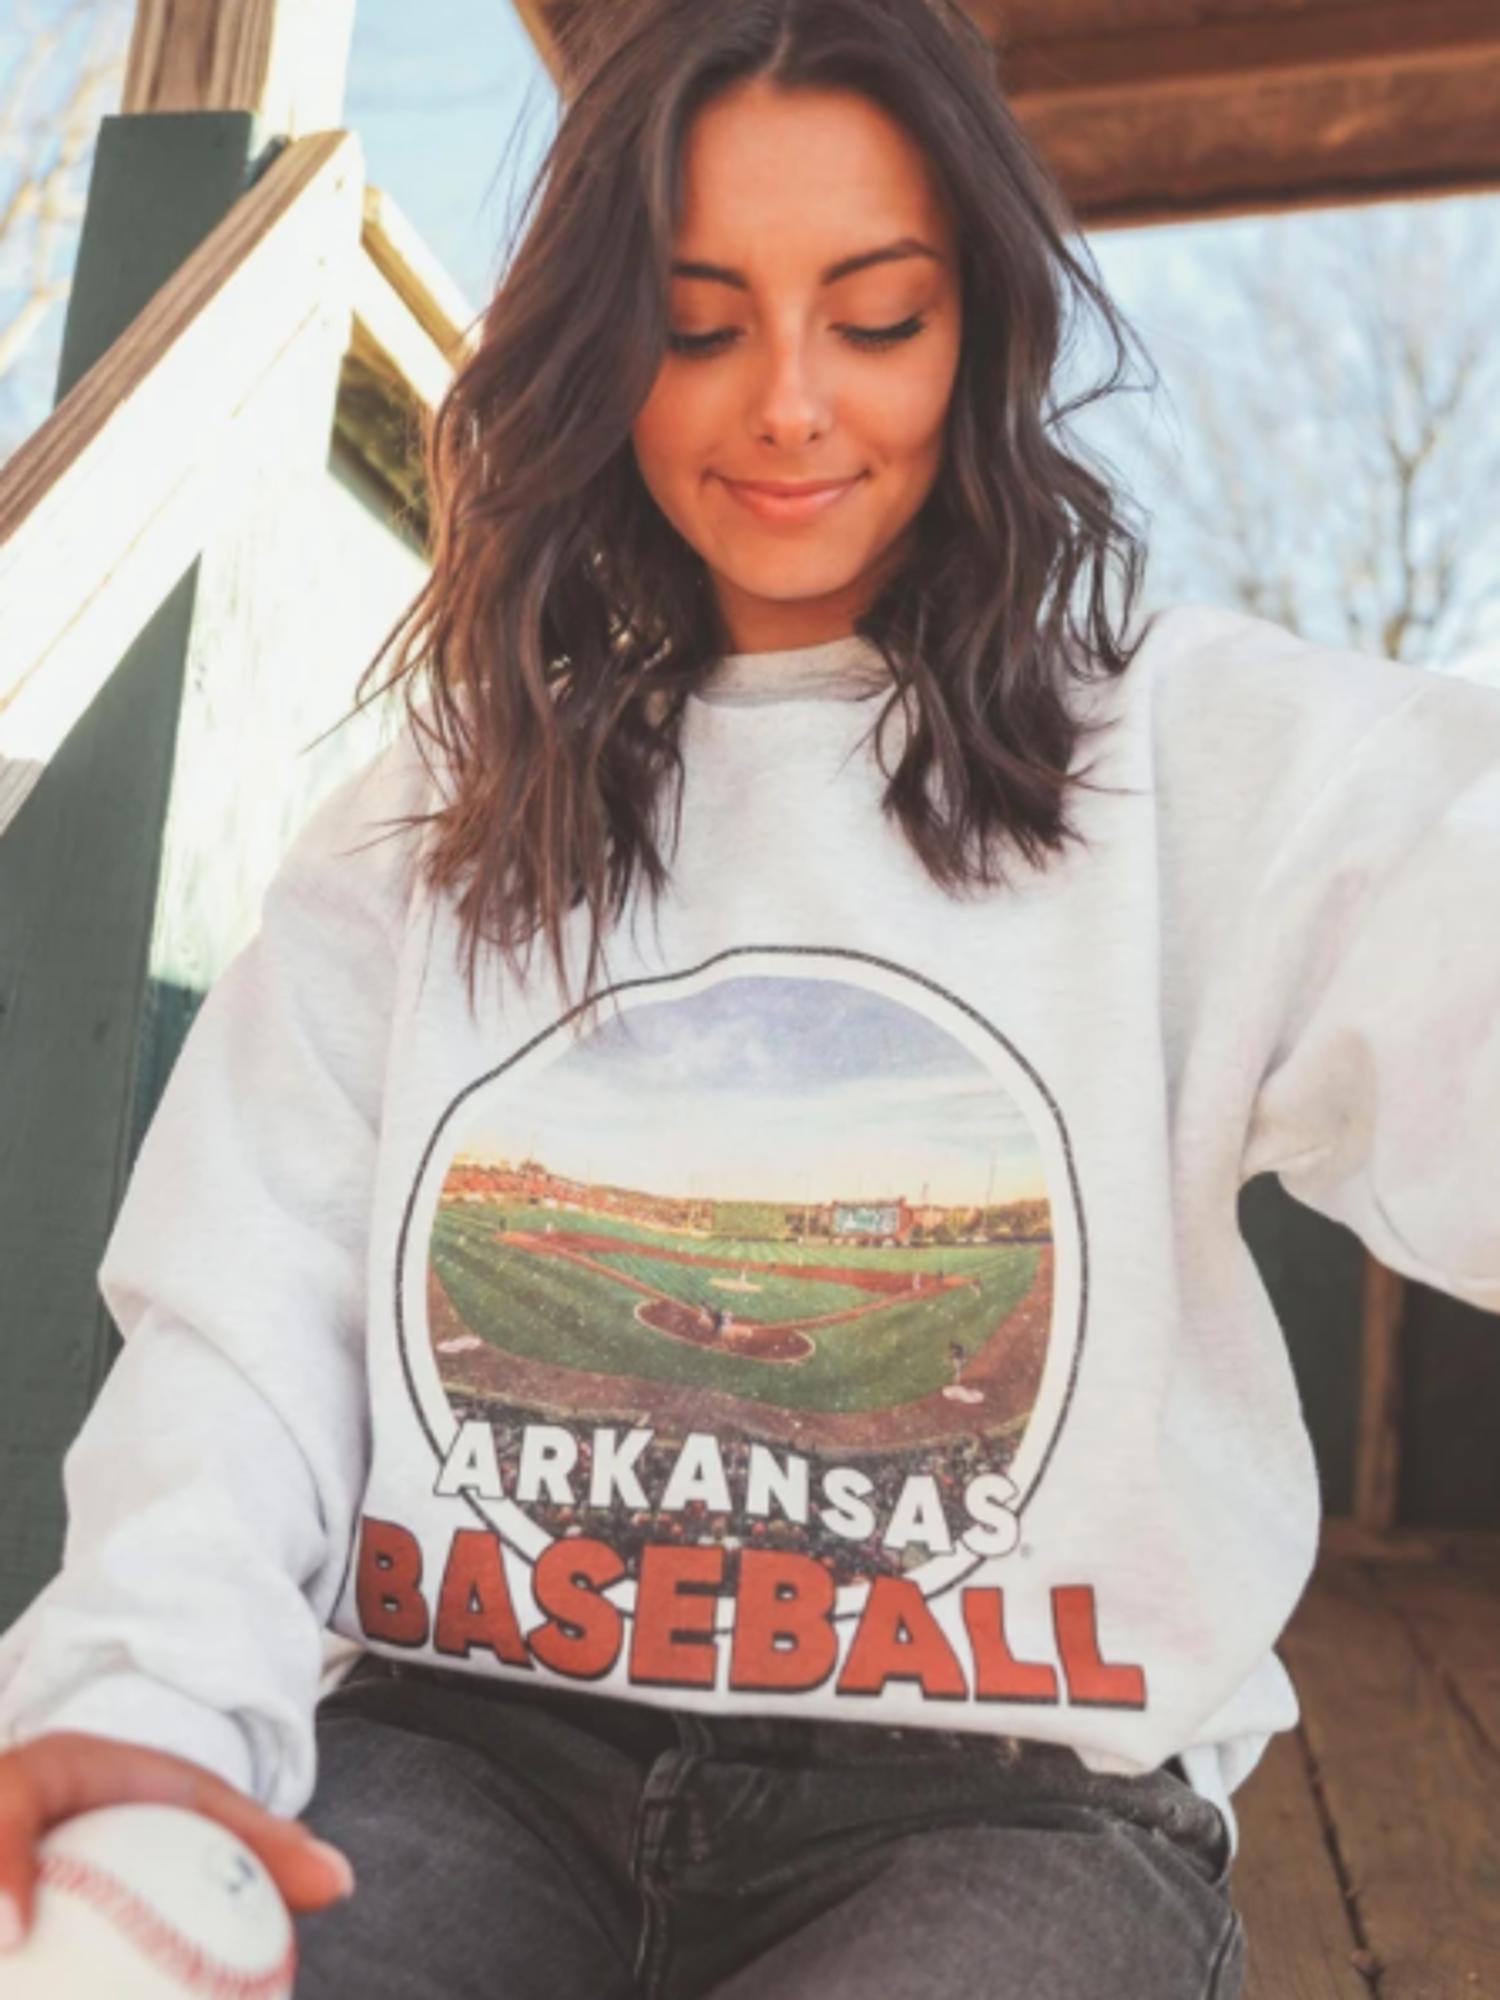 image of: Arkansas Razorbacks Women's Baseball Baum Vintage Sweatshirt